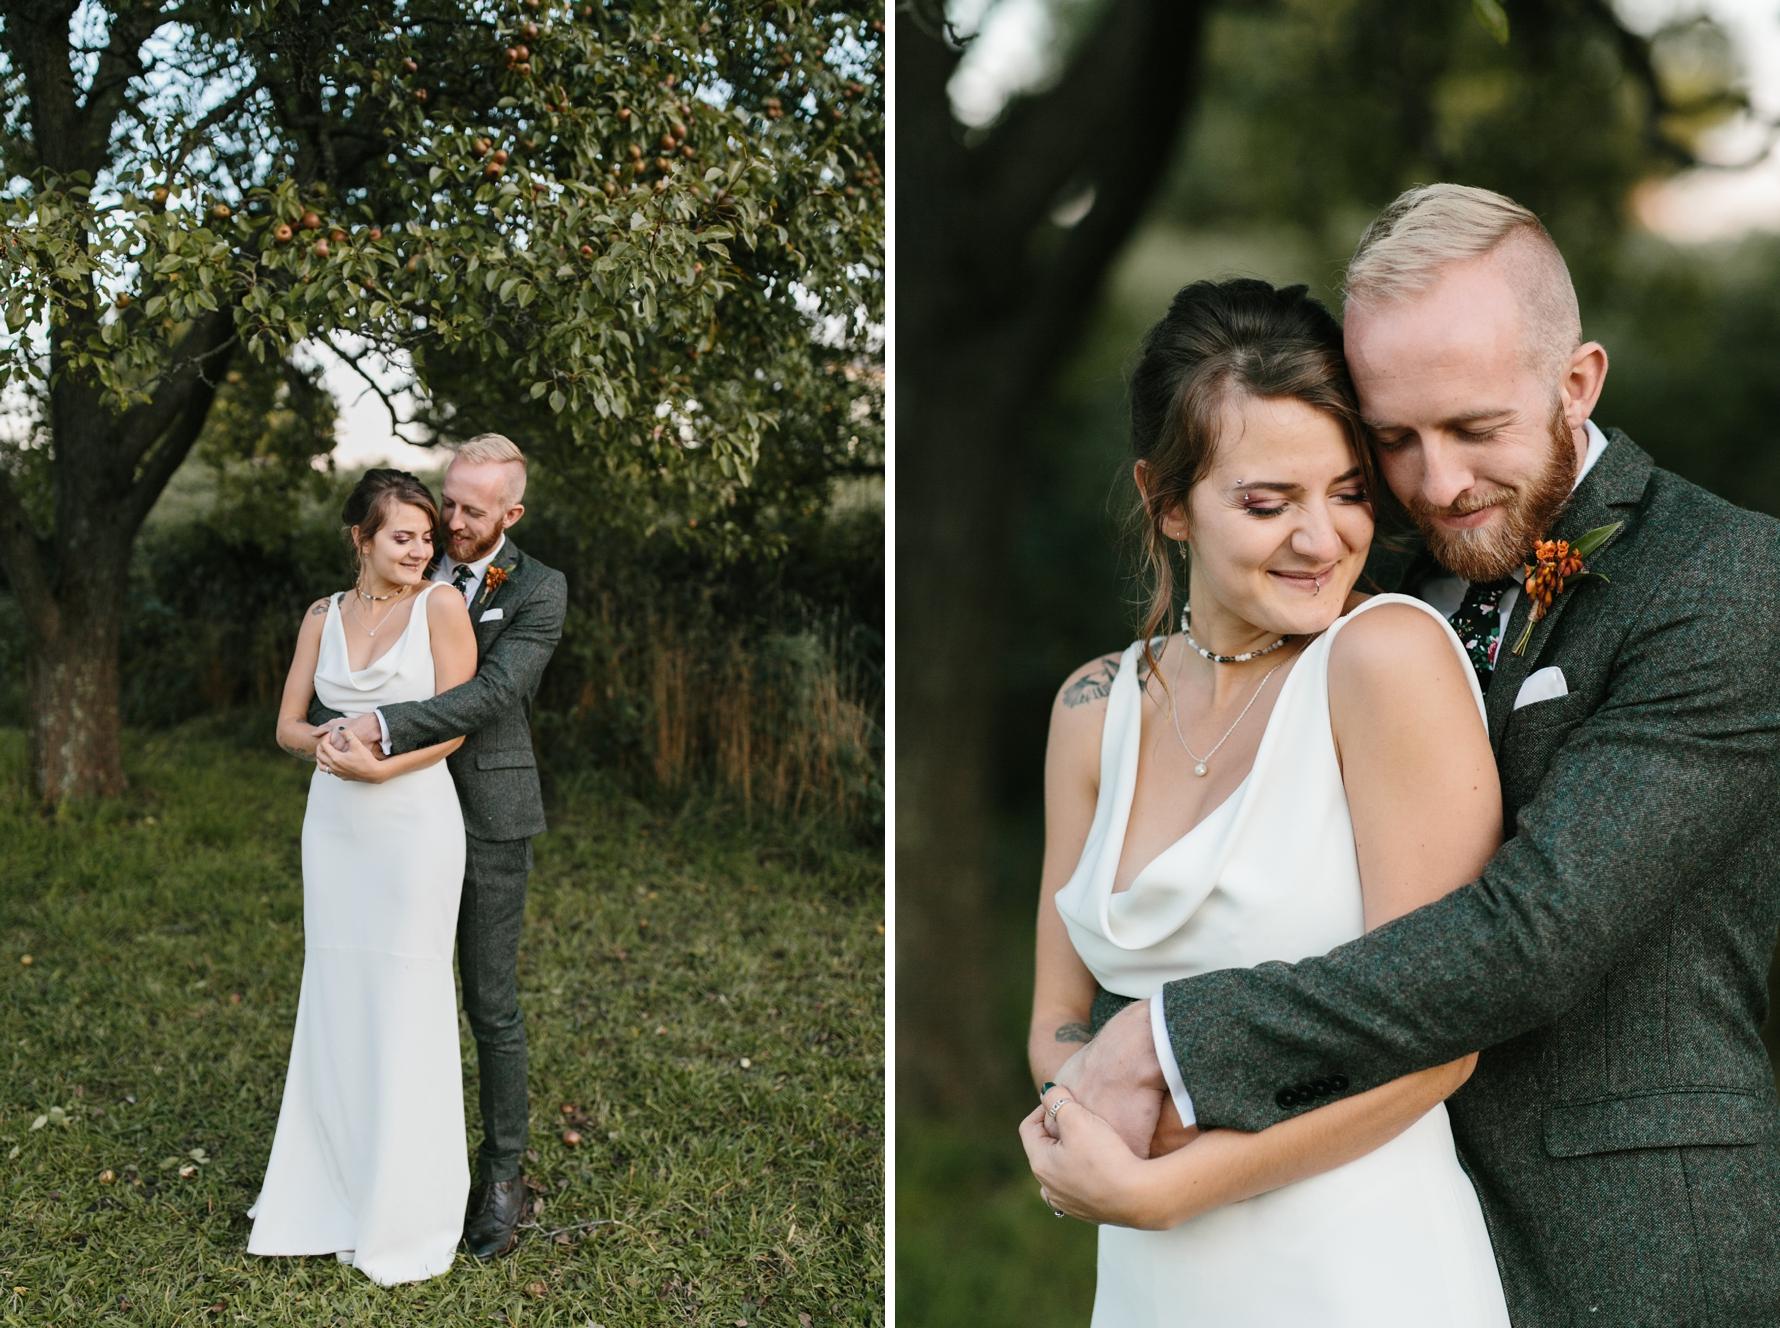 norris-traverse-city-wedding-65.JPG